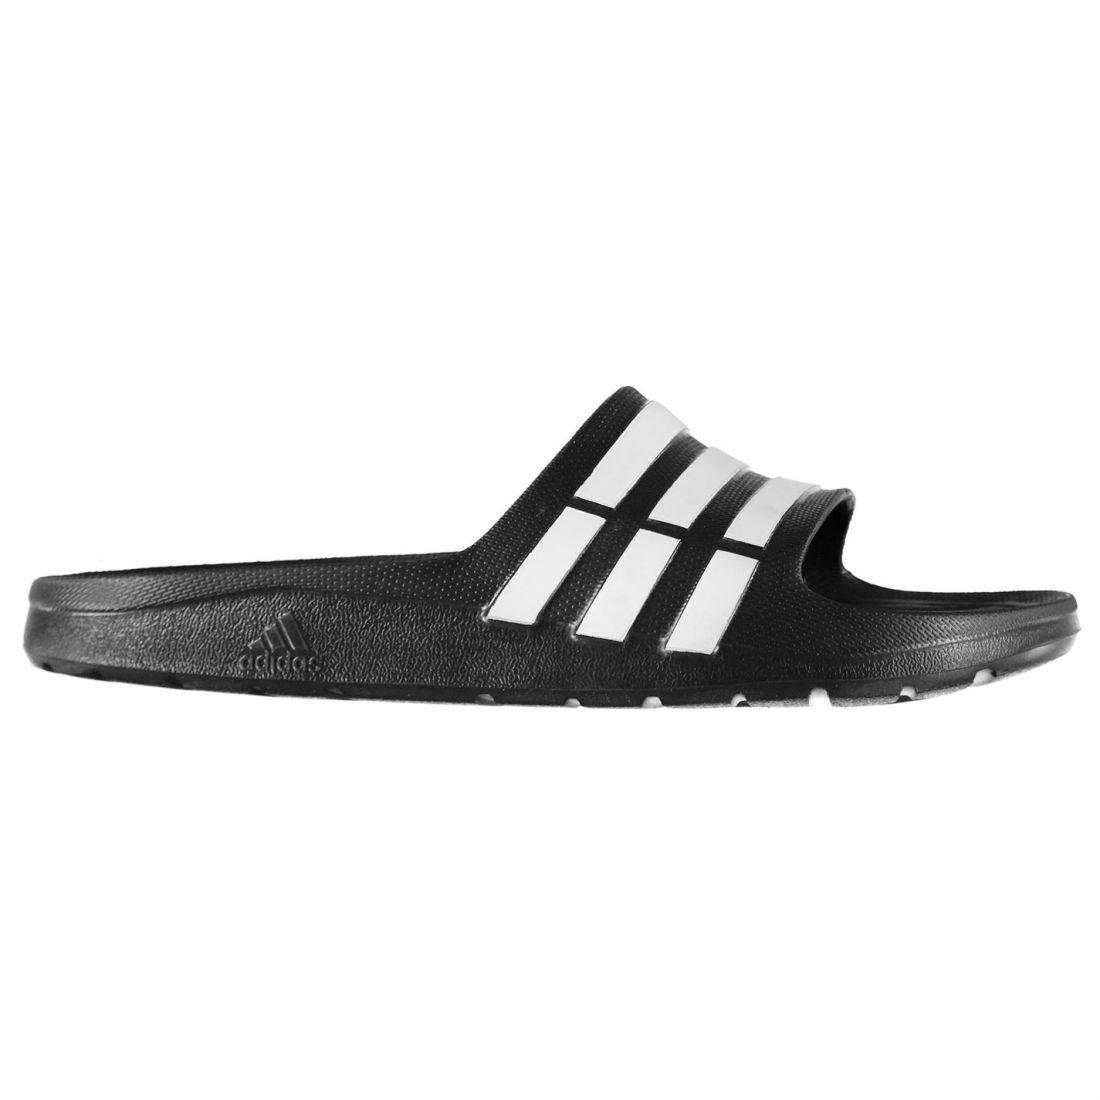 58b0c92d41e9ed adidas Kids Duramo Junior Sliders Pool Shoes Flip Flops Beach ...